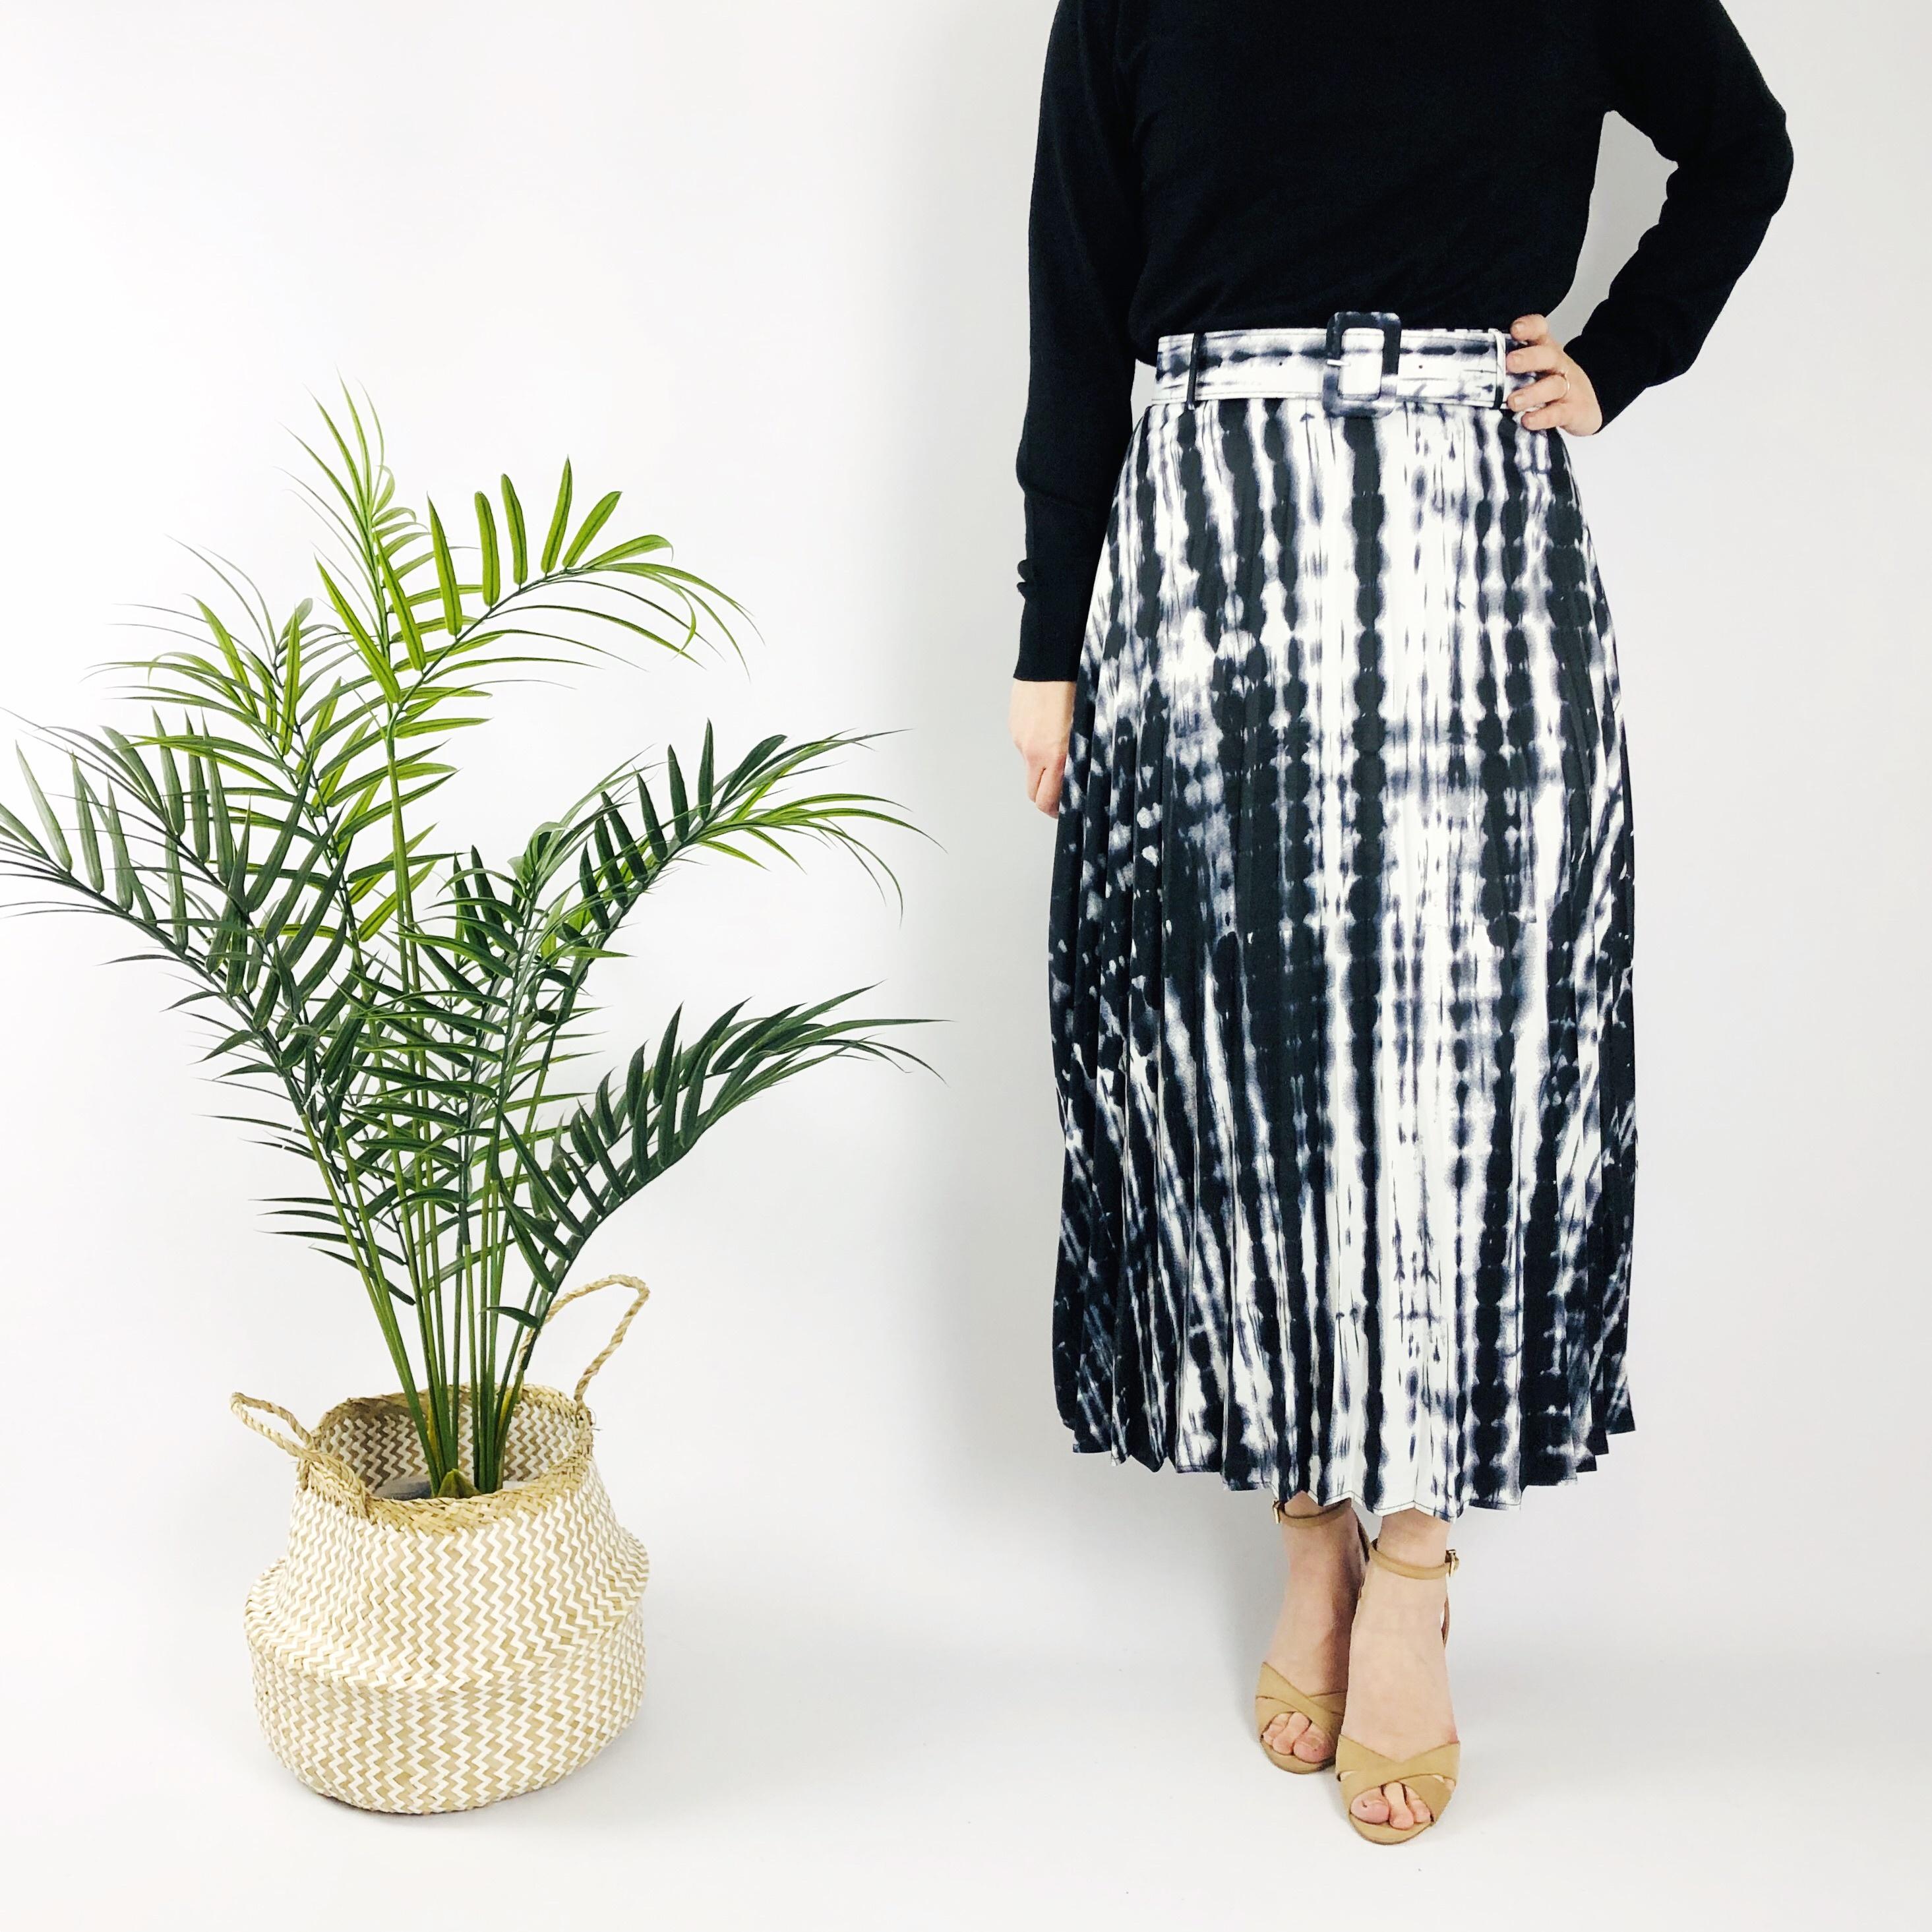 Lily White Tie Dye Skirt 11088